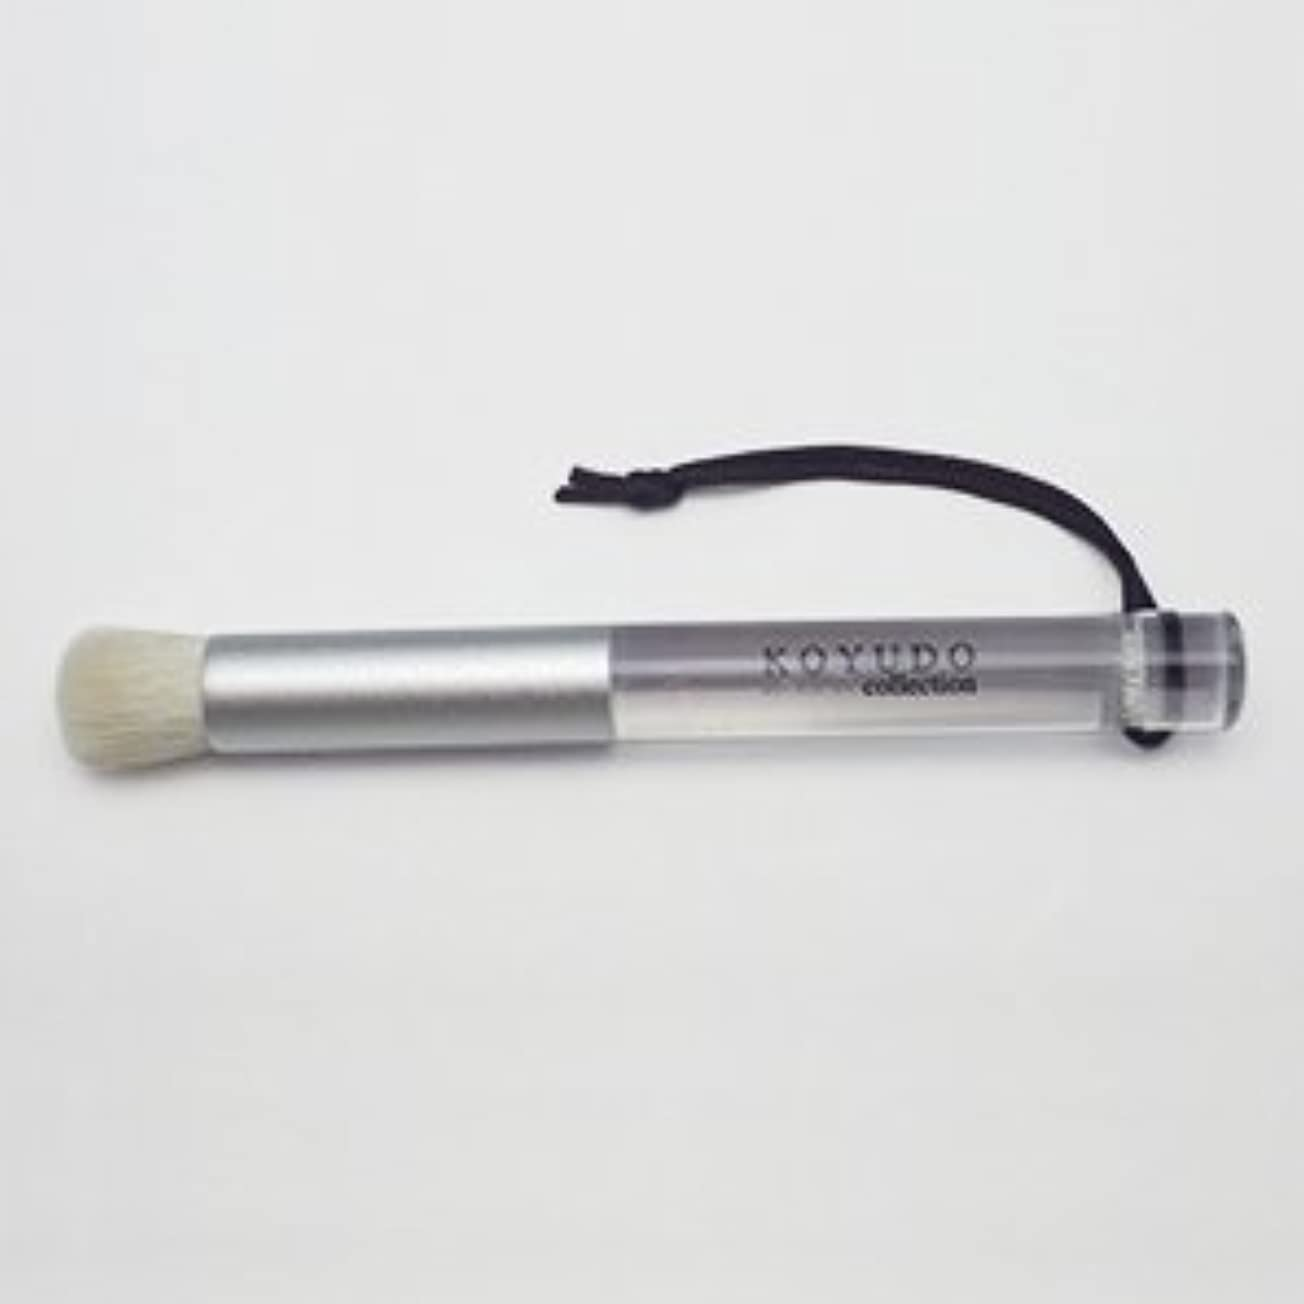 量で規範実行可能広島県 熊野筆 小鼻洗顔ブラシ W4-YSM